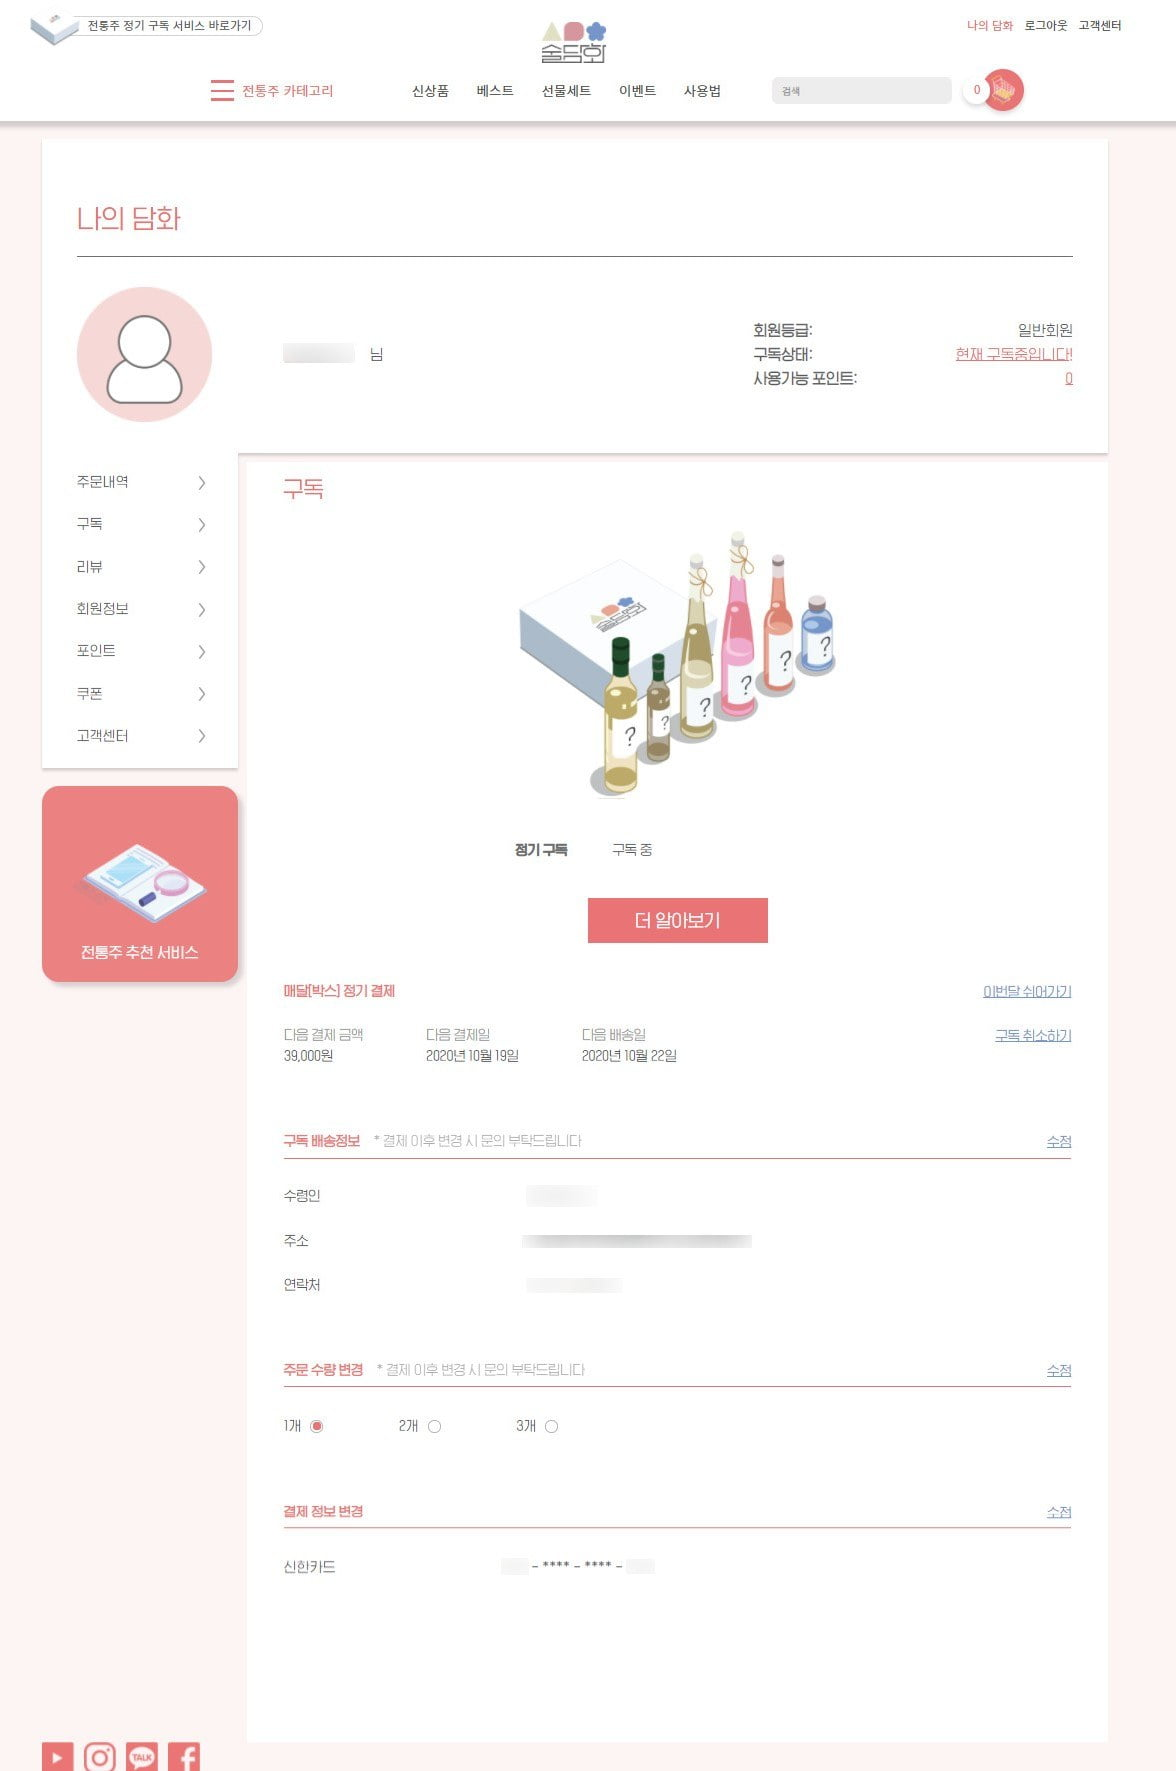 sooldamhwa liquor delivery in Korea